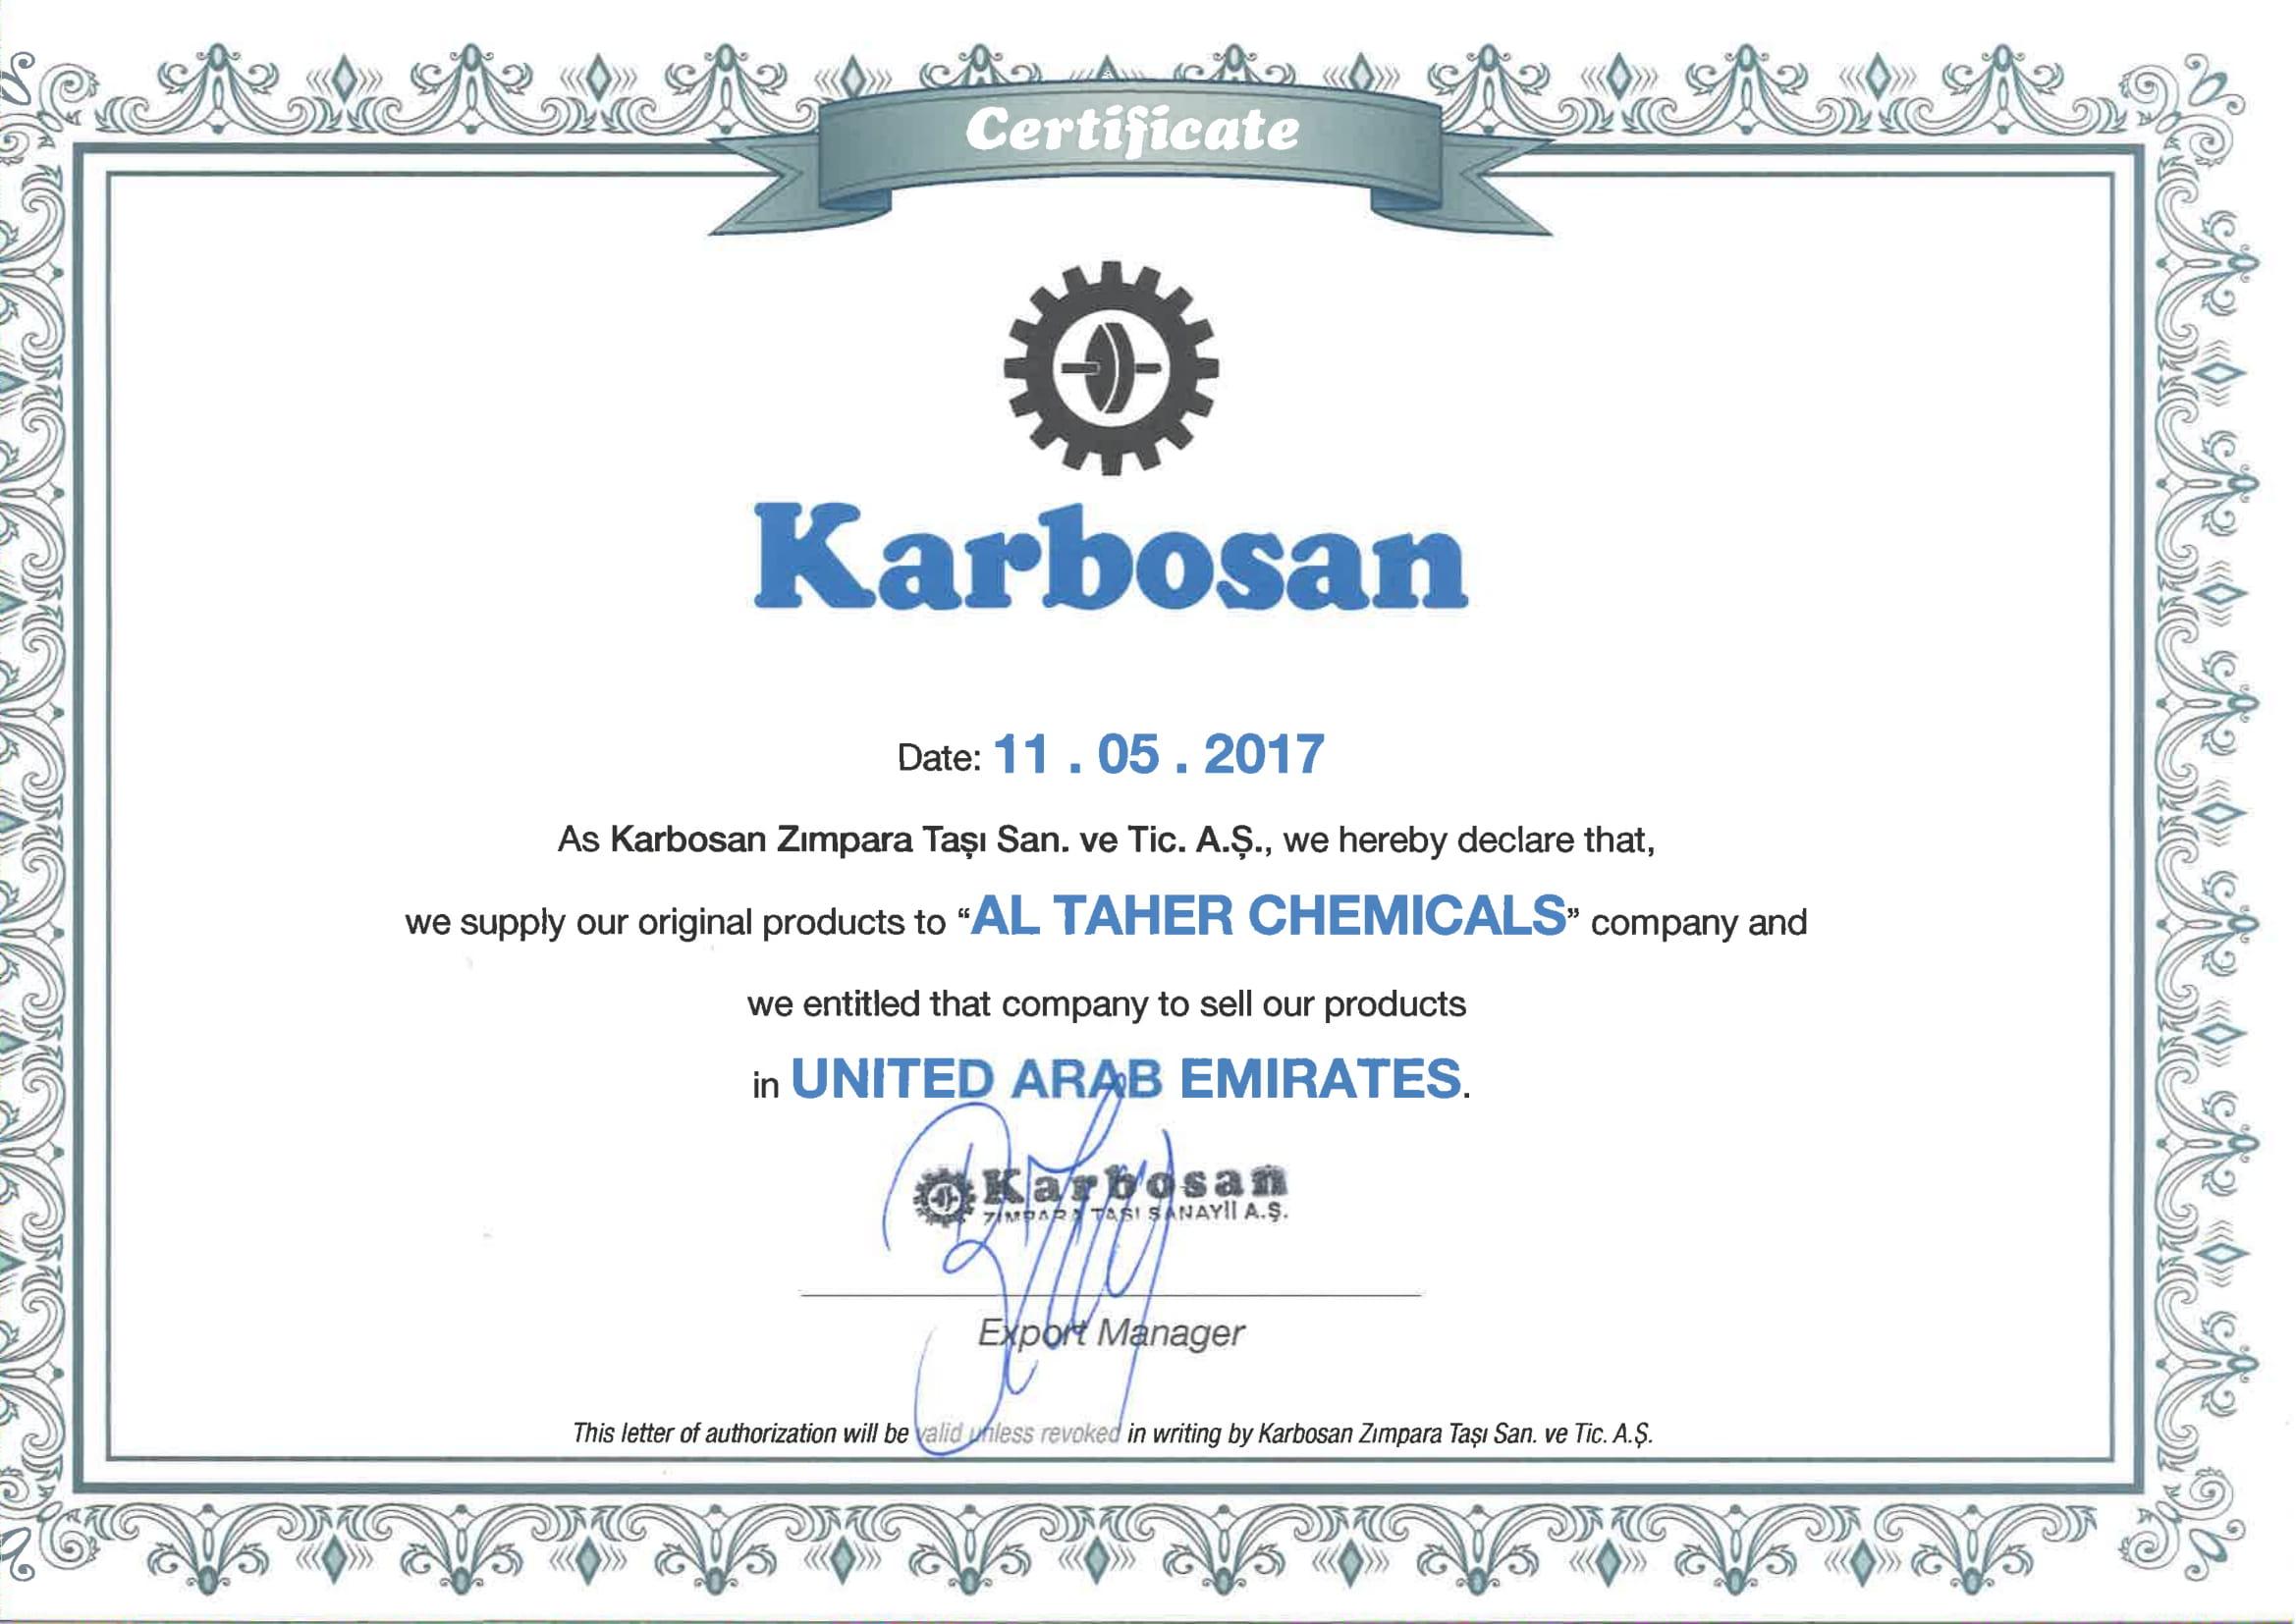 Karbosan Certificate